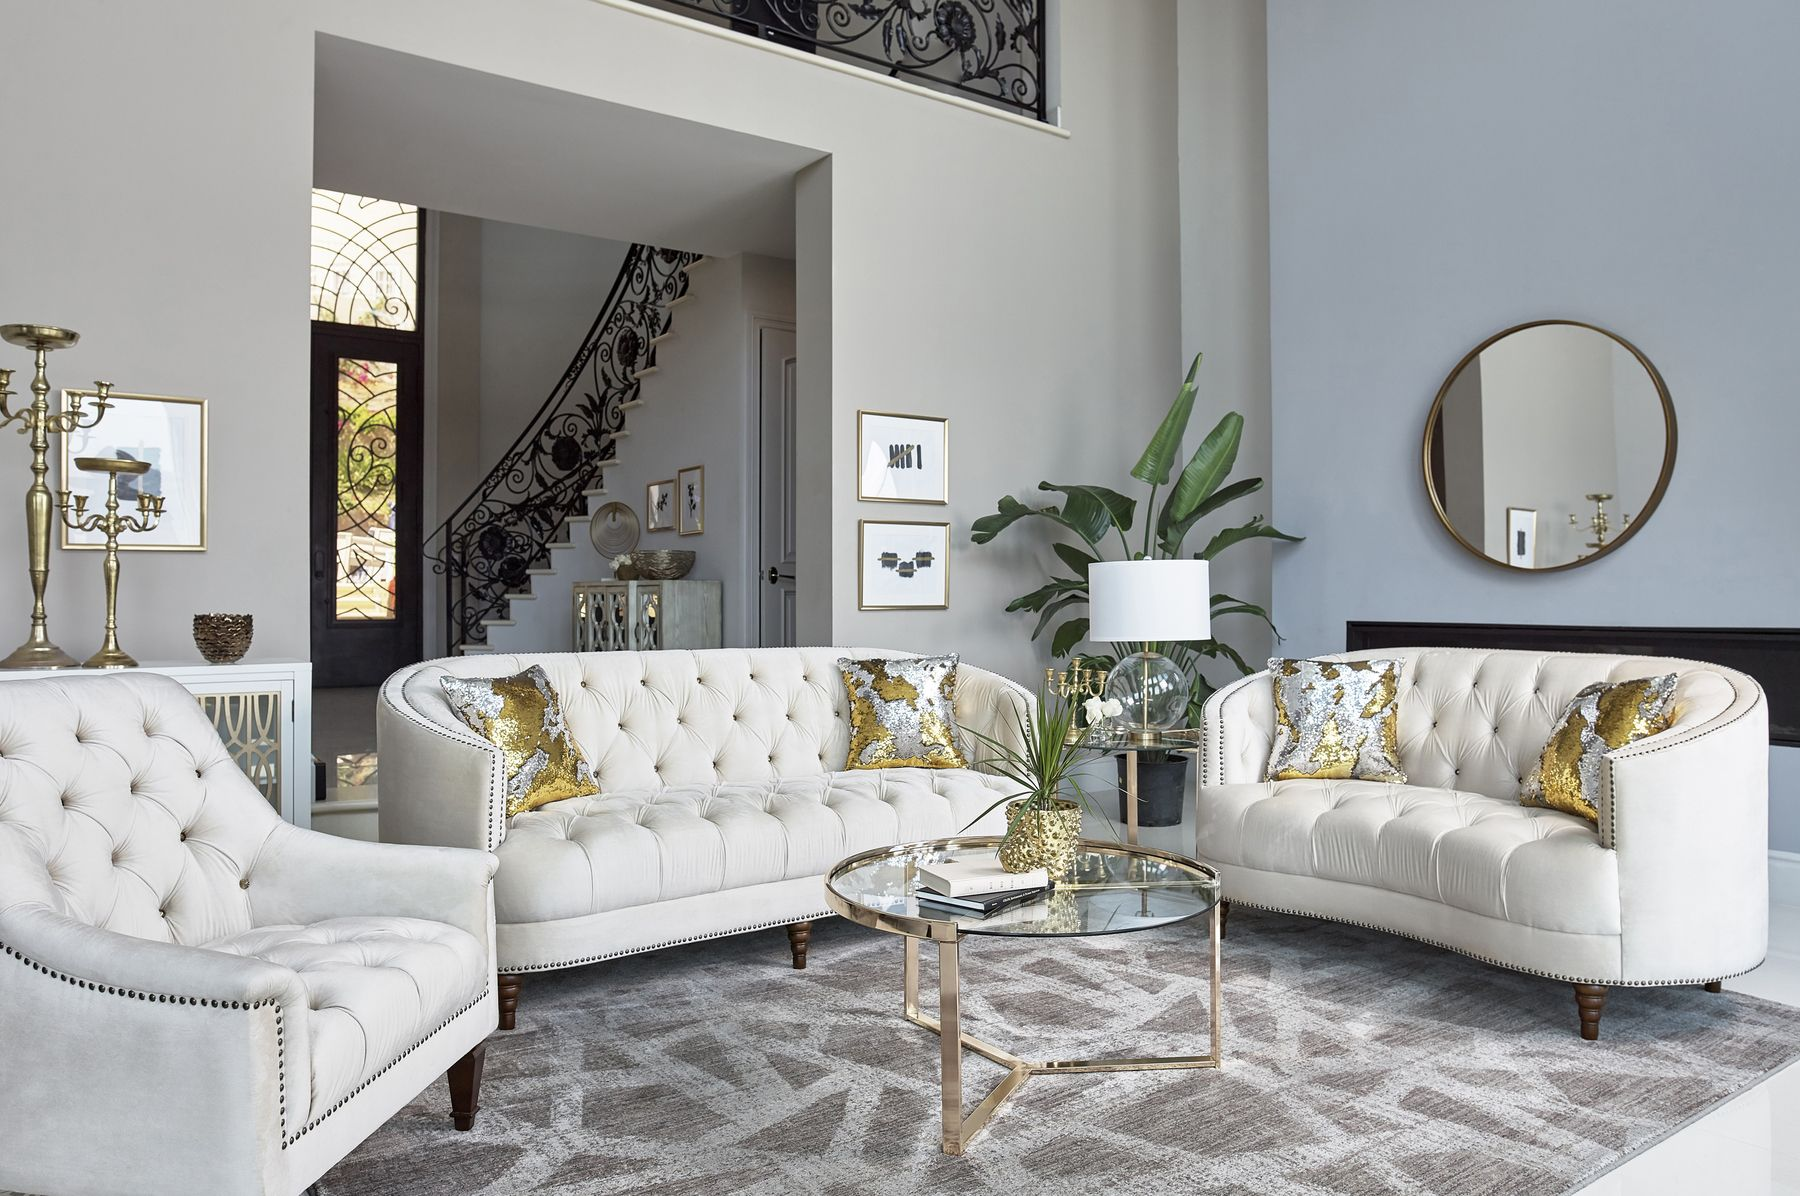 Avonlea Off White Sofa 509161 930251 Lenum Coaster Furniture Fabric Sofas White Sofa Living Room Glam Living Room White Living Room Decor